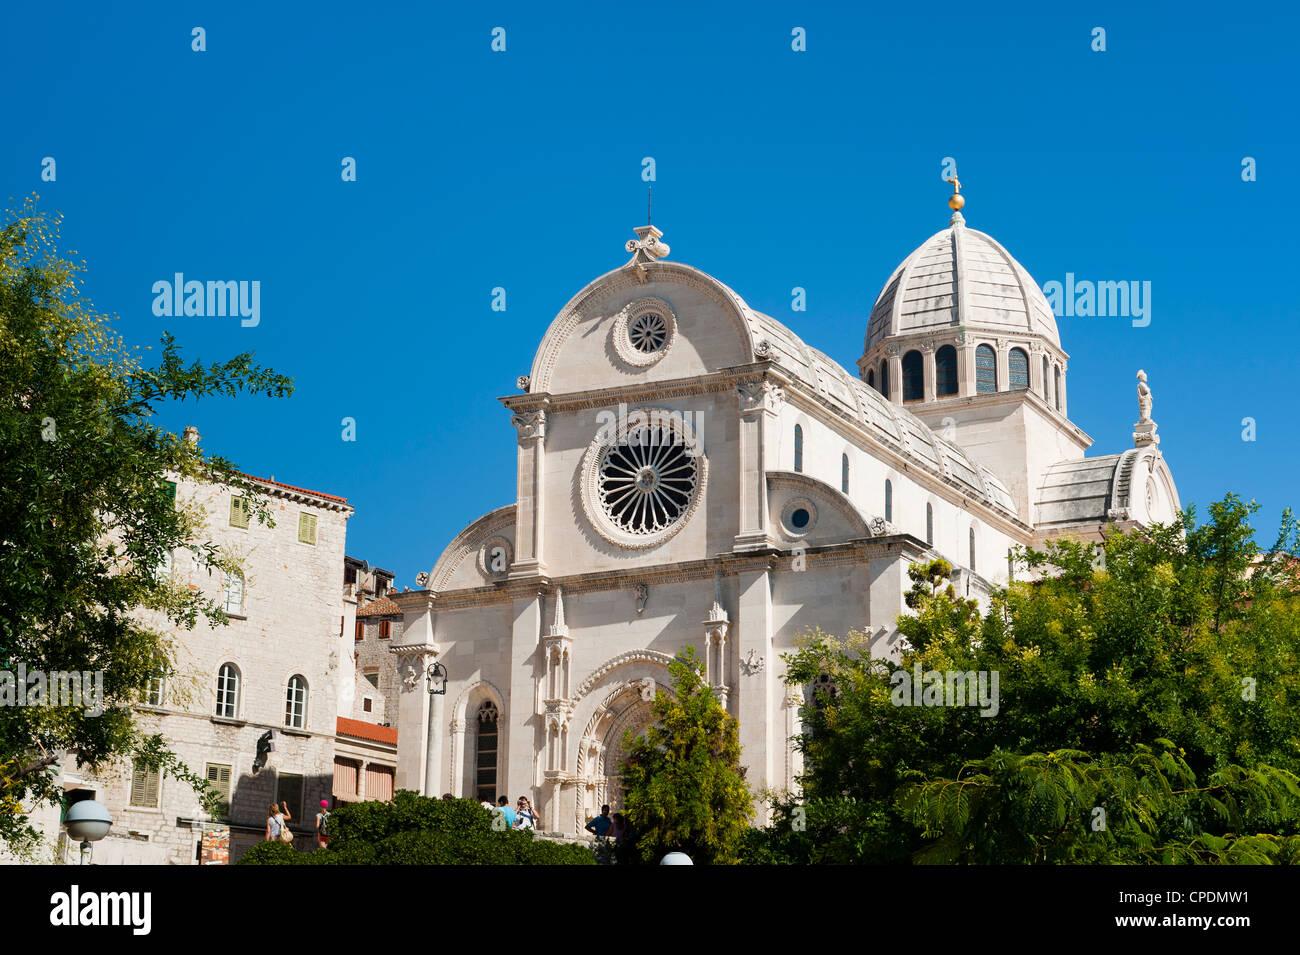 Katedrala Sv. Gjakove (St. James Cathedral), UNESCO-Weltkulturerbe, Sibenik, Dalmatien, Kroatien, Europa Stockbild